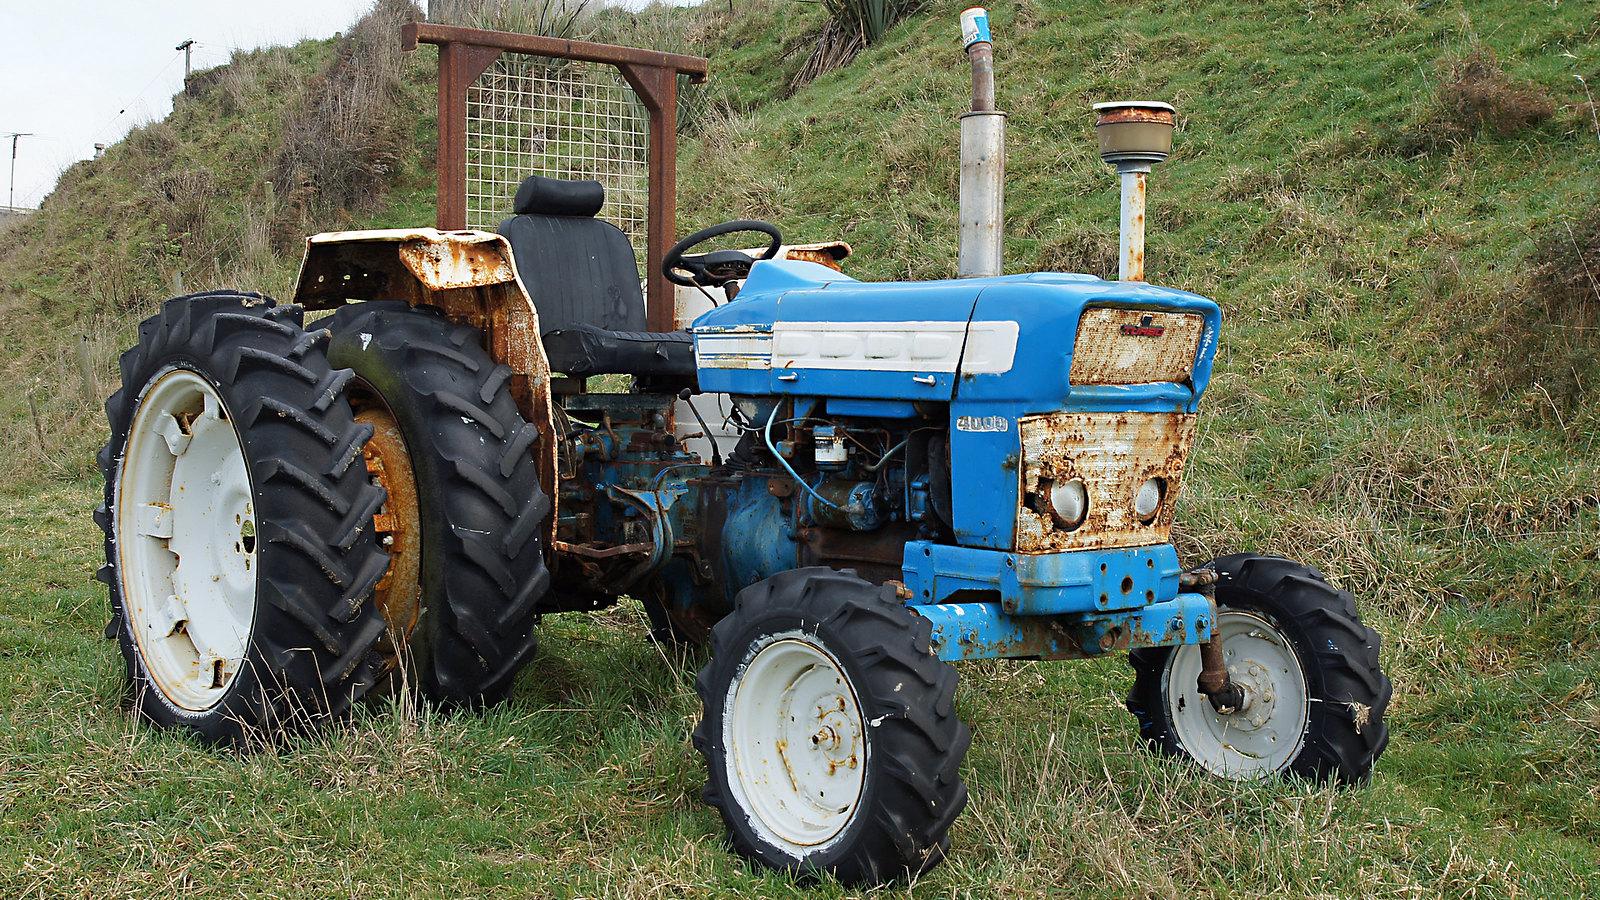 Ford 4000 Diesel Tractor Manual : Ford diesel tractor bing images